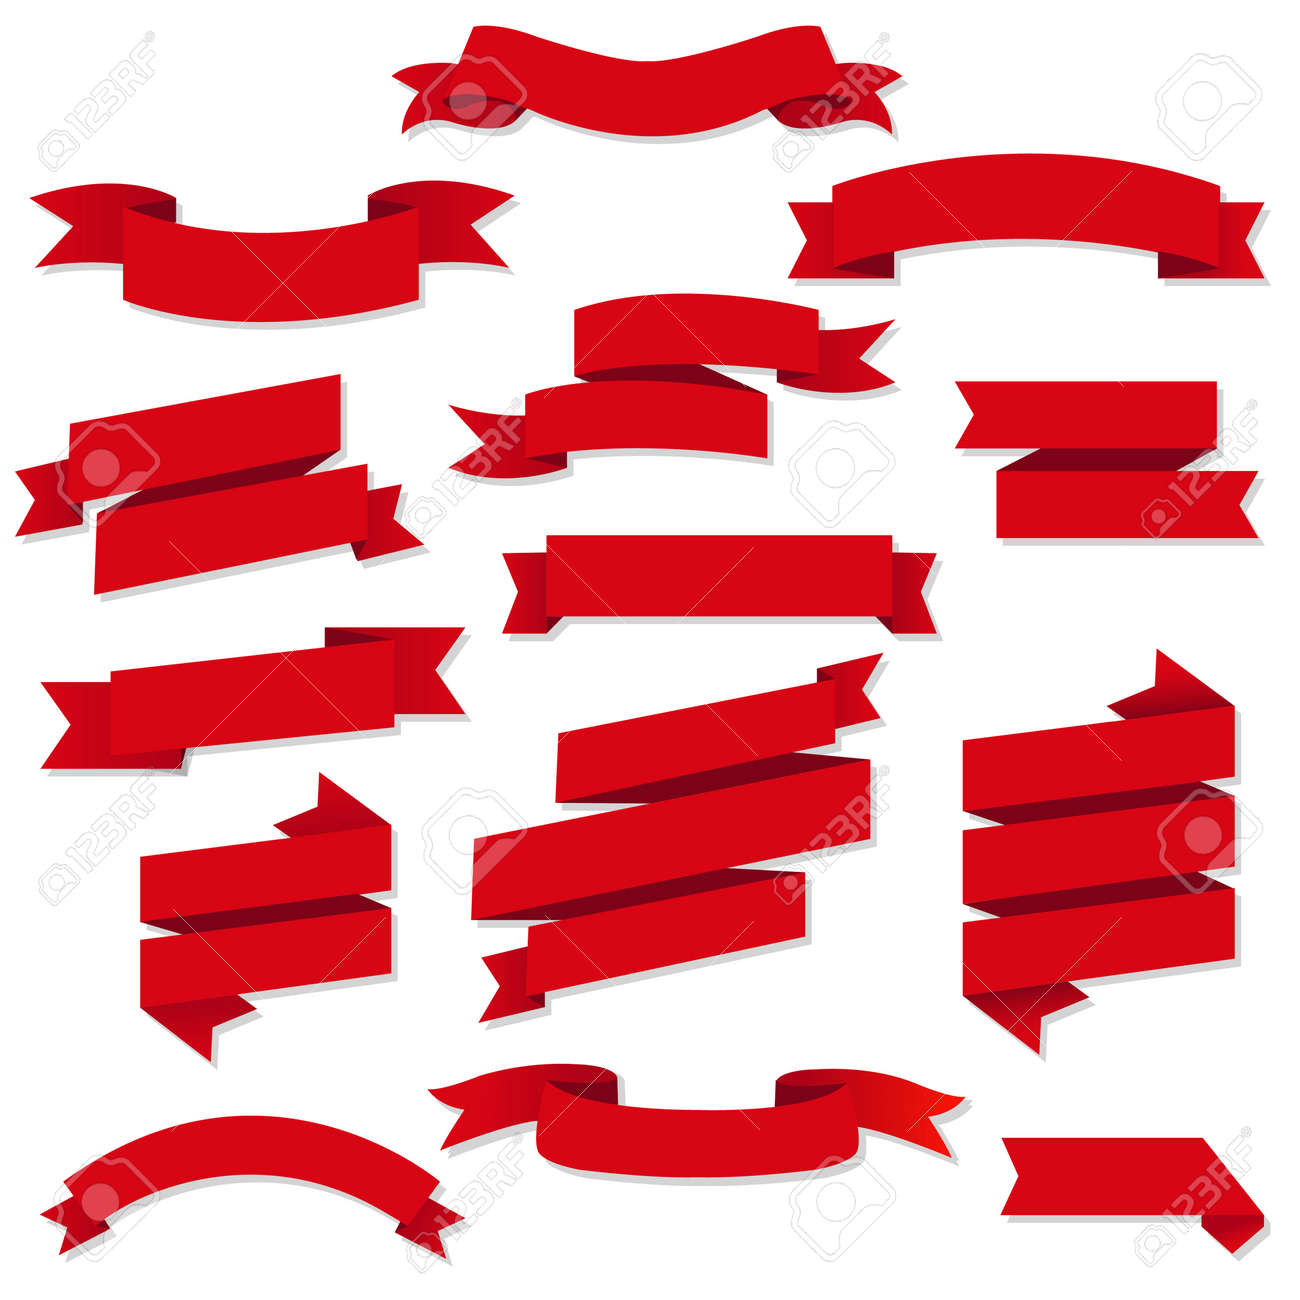 Red Web Ribbons Set, Vector Illustration - 39321988